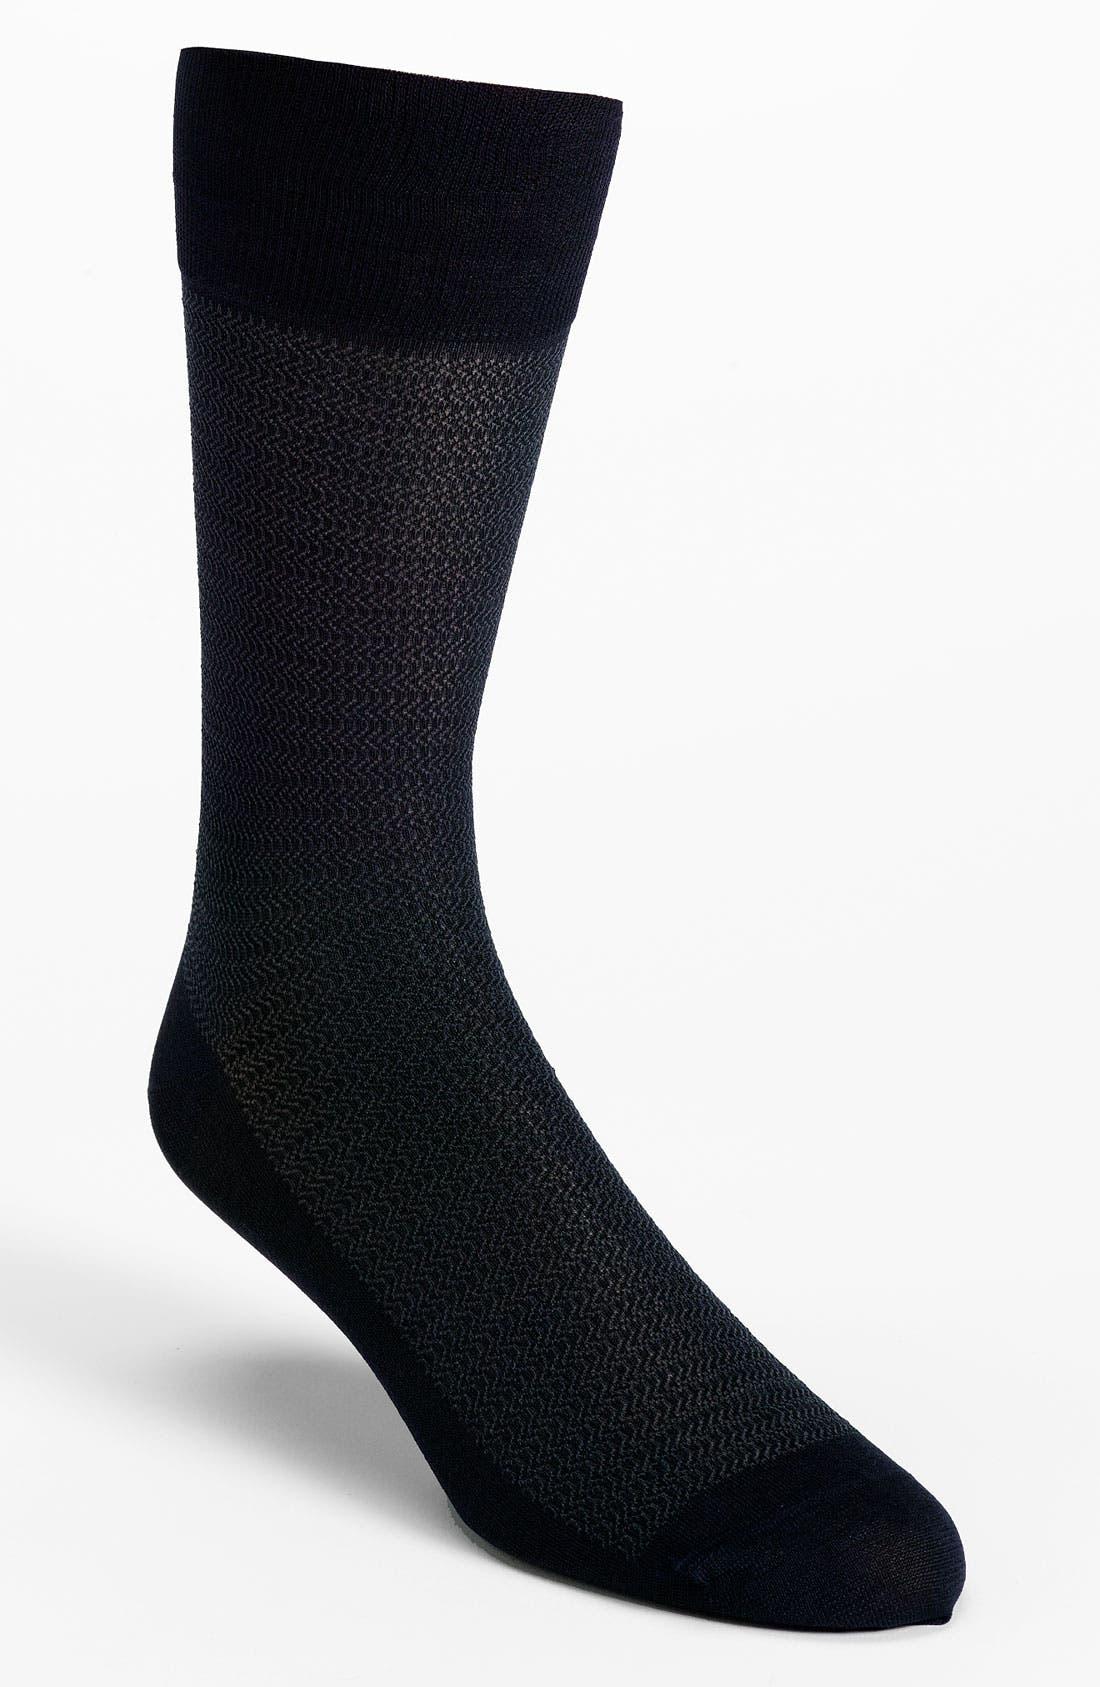 Alternate Image 1 Selected - John W. Nordstrom® 'Wave' Socks